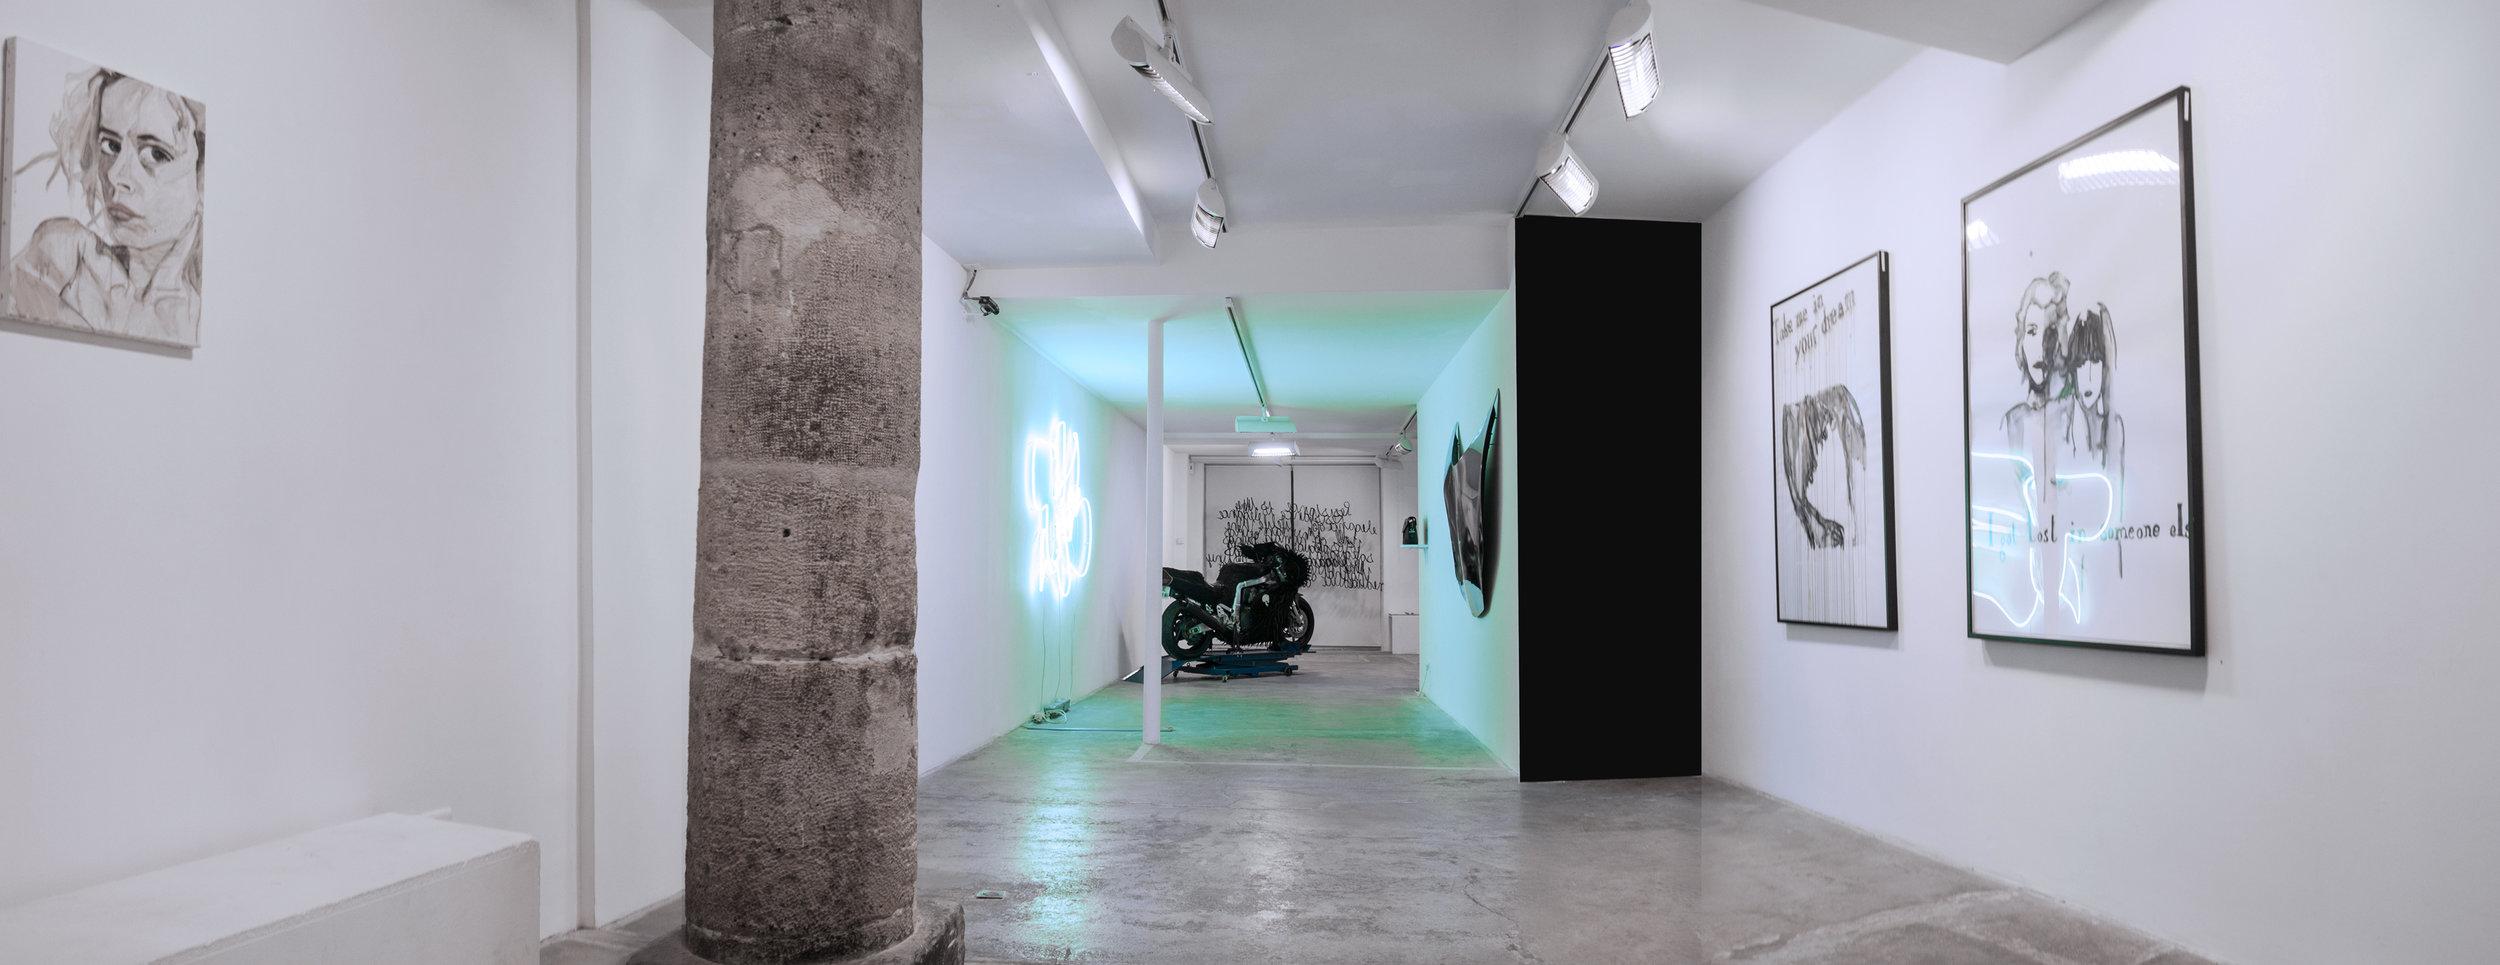 GalerieFiat_panorama_lighttouch.jpg